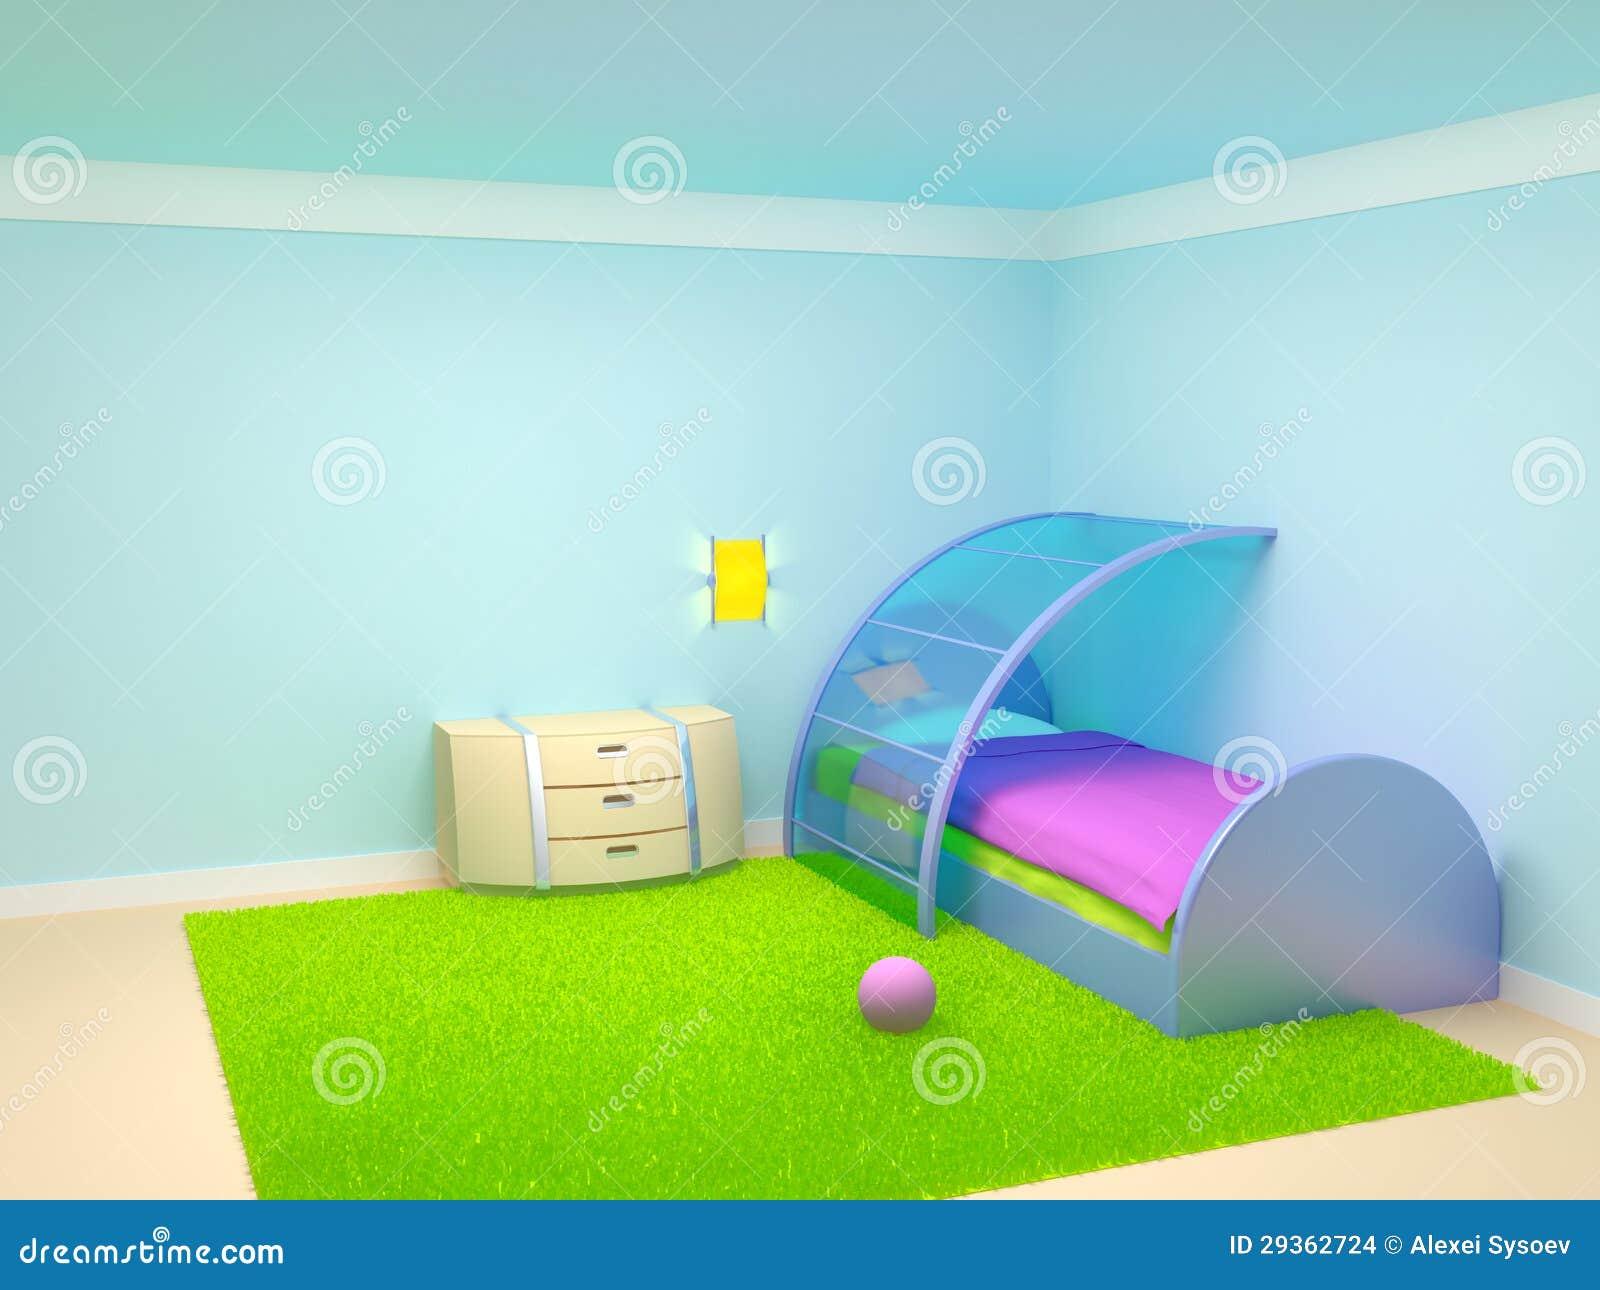 chambre coucher futuriste d 39 enfant images stock image. Black Bedroom Furniture Sets. Home Design Ideas